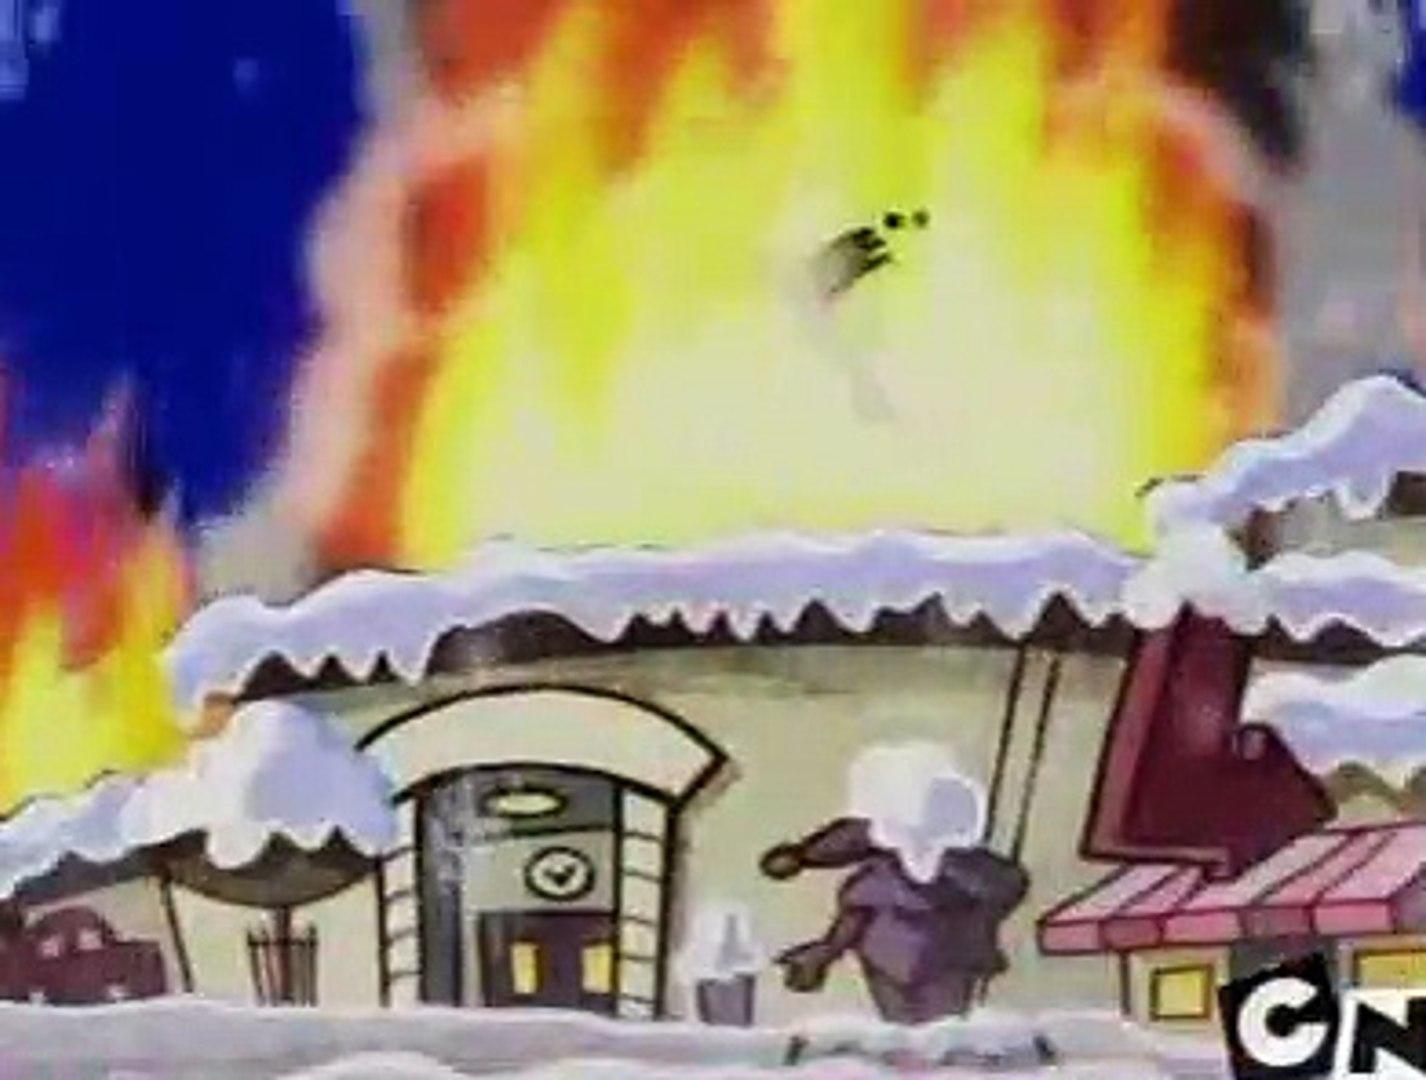 Billy and Mandy - S5E14 - Billy & Mandy Save Christmas